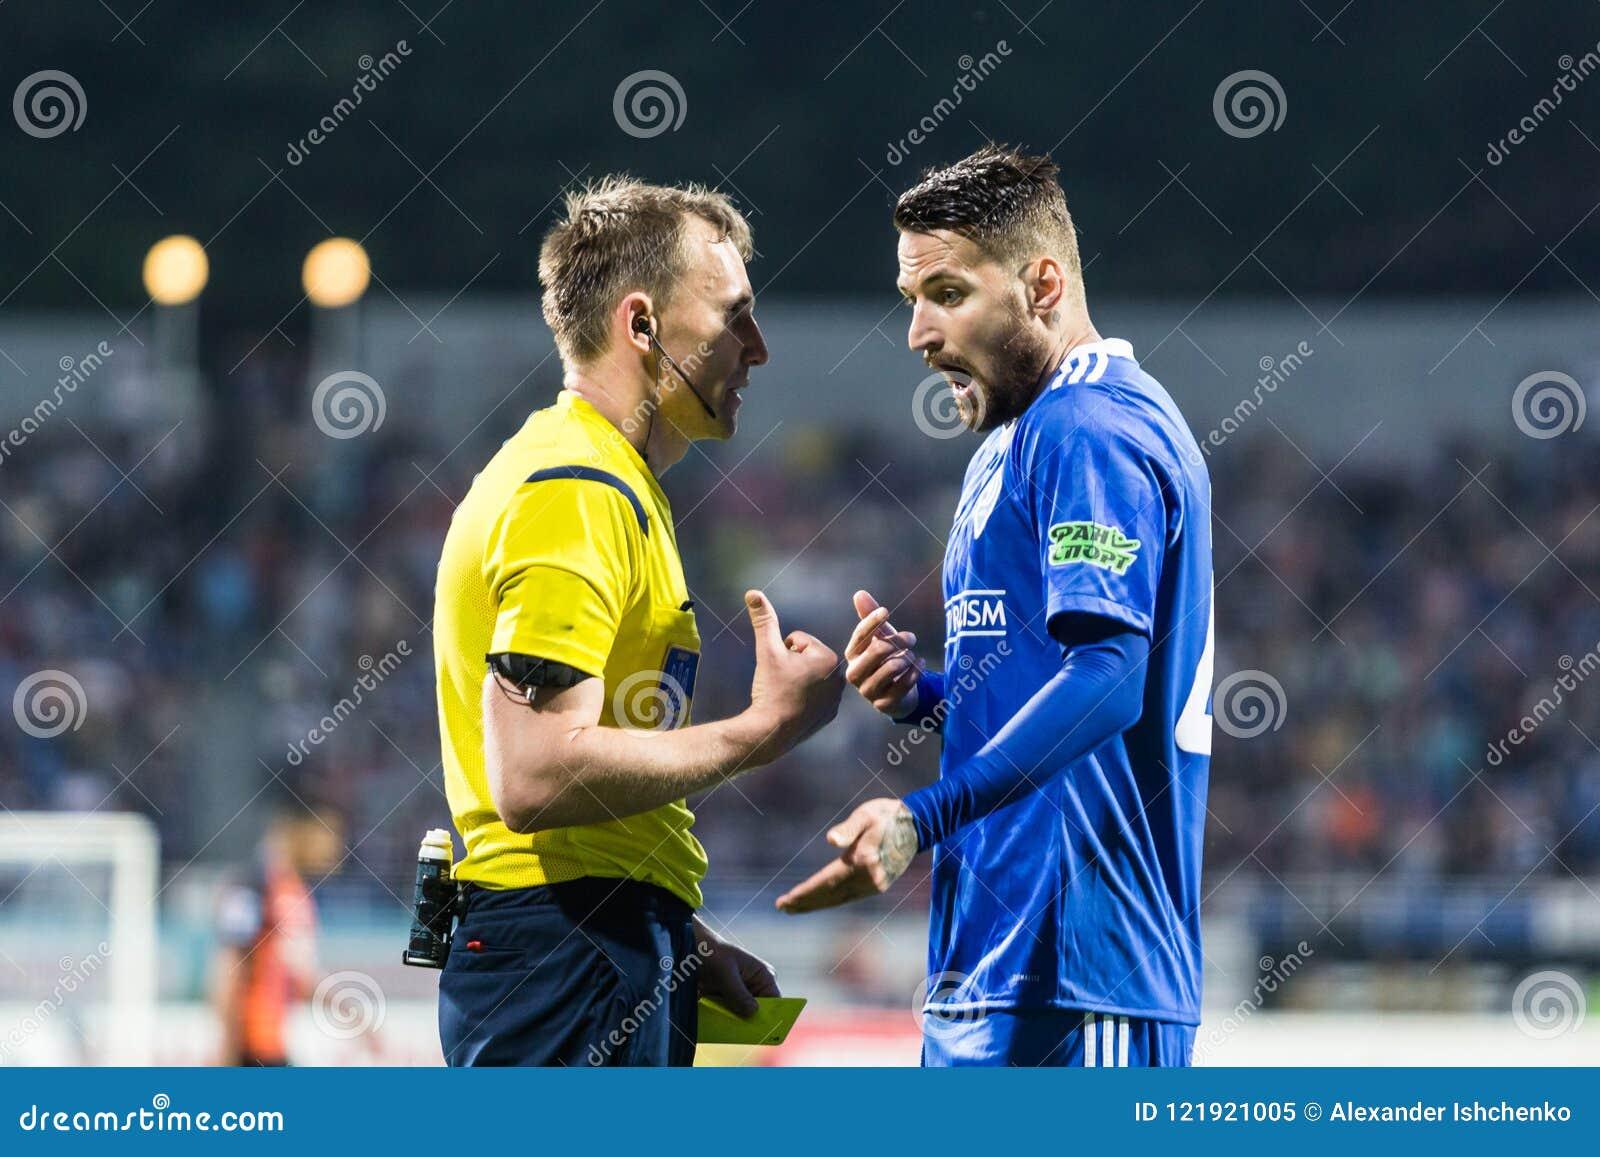 Ukrainian Premier League match Dynamo Kyiv - Shakhtar Donetsk, M